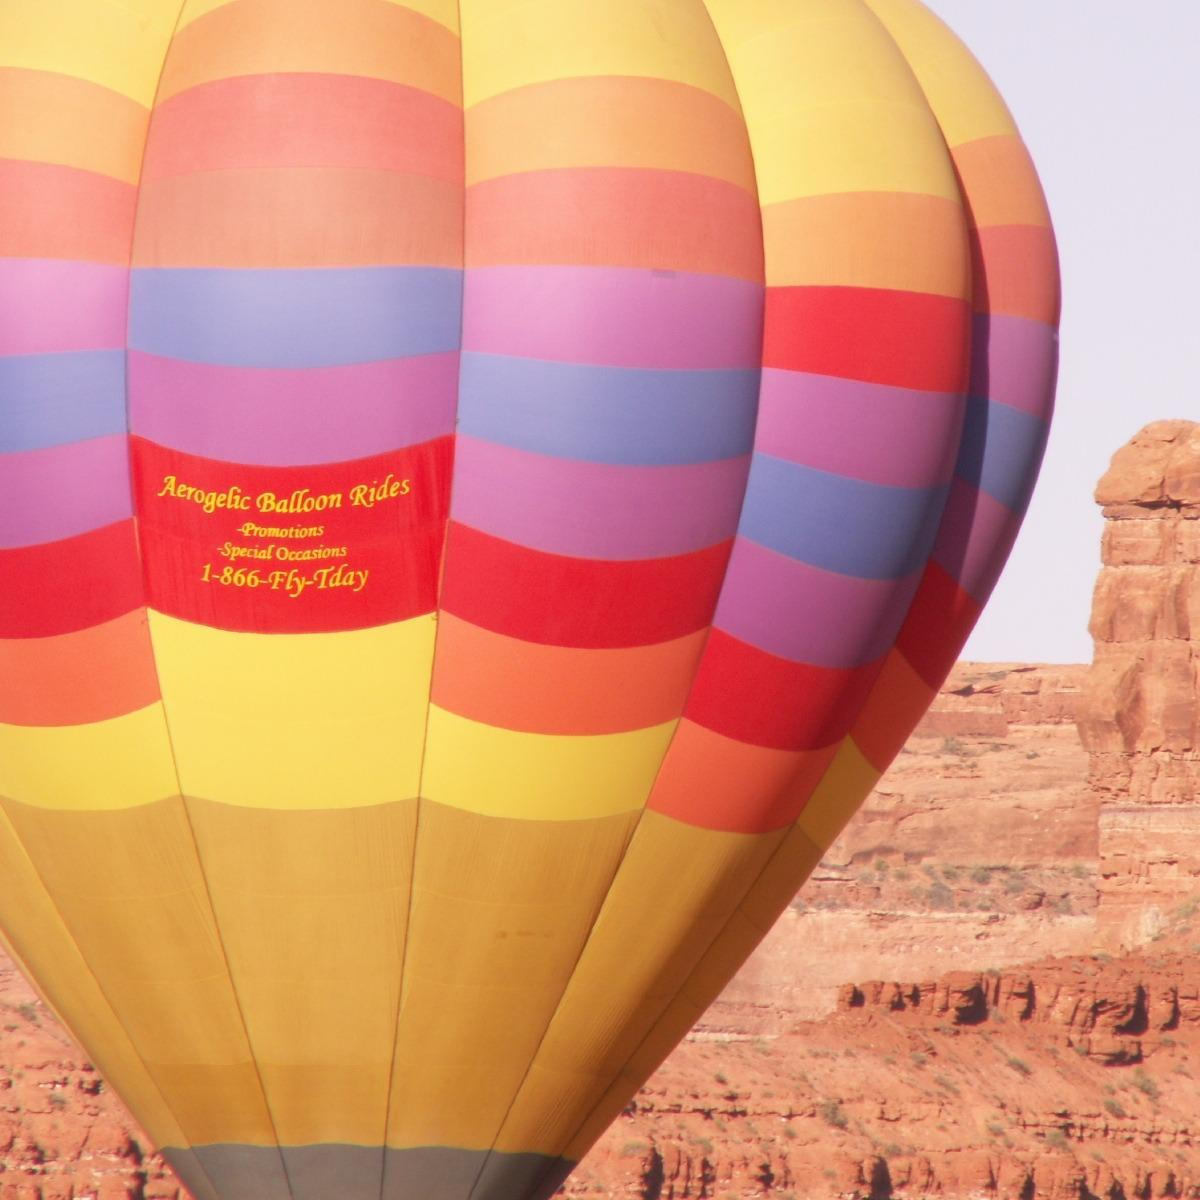 Phoenix Hot Air Balloon Rides- Aerogelic Ballooning